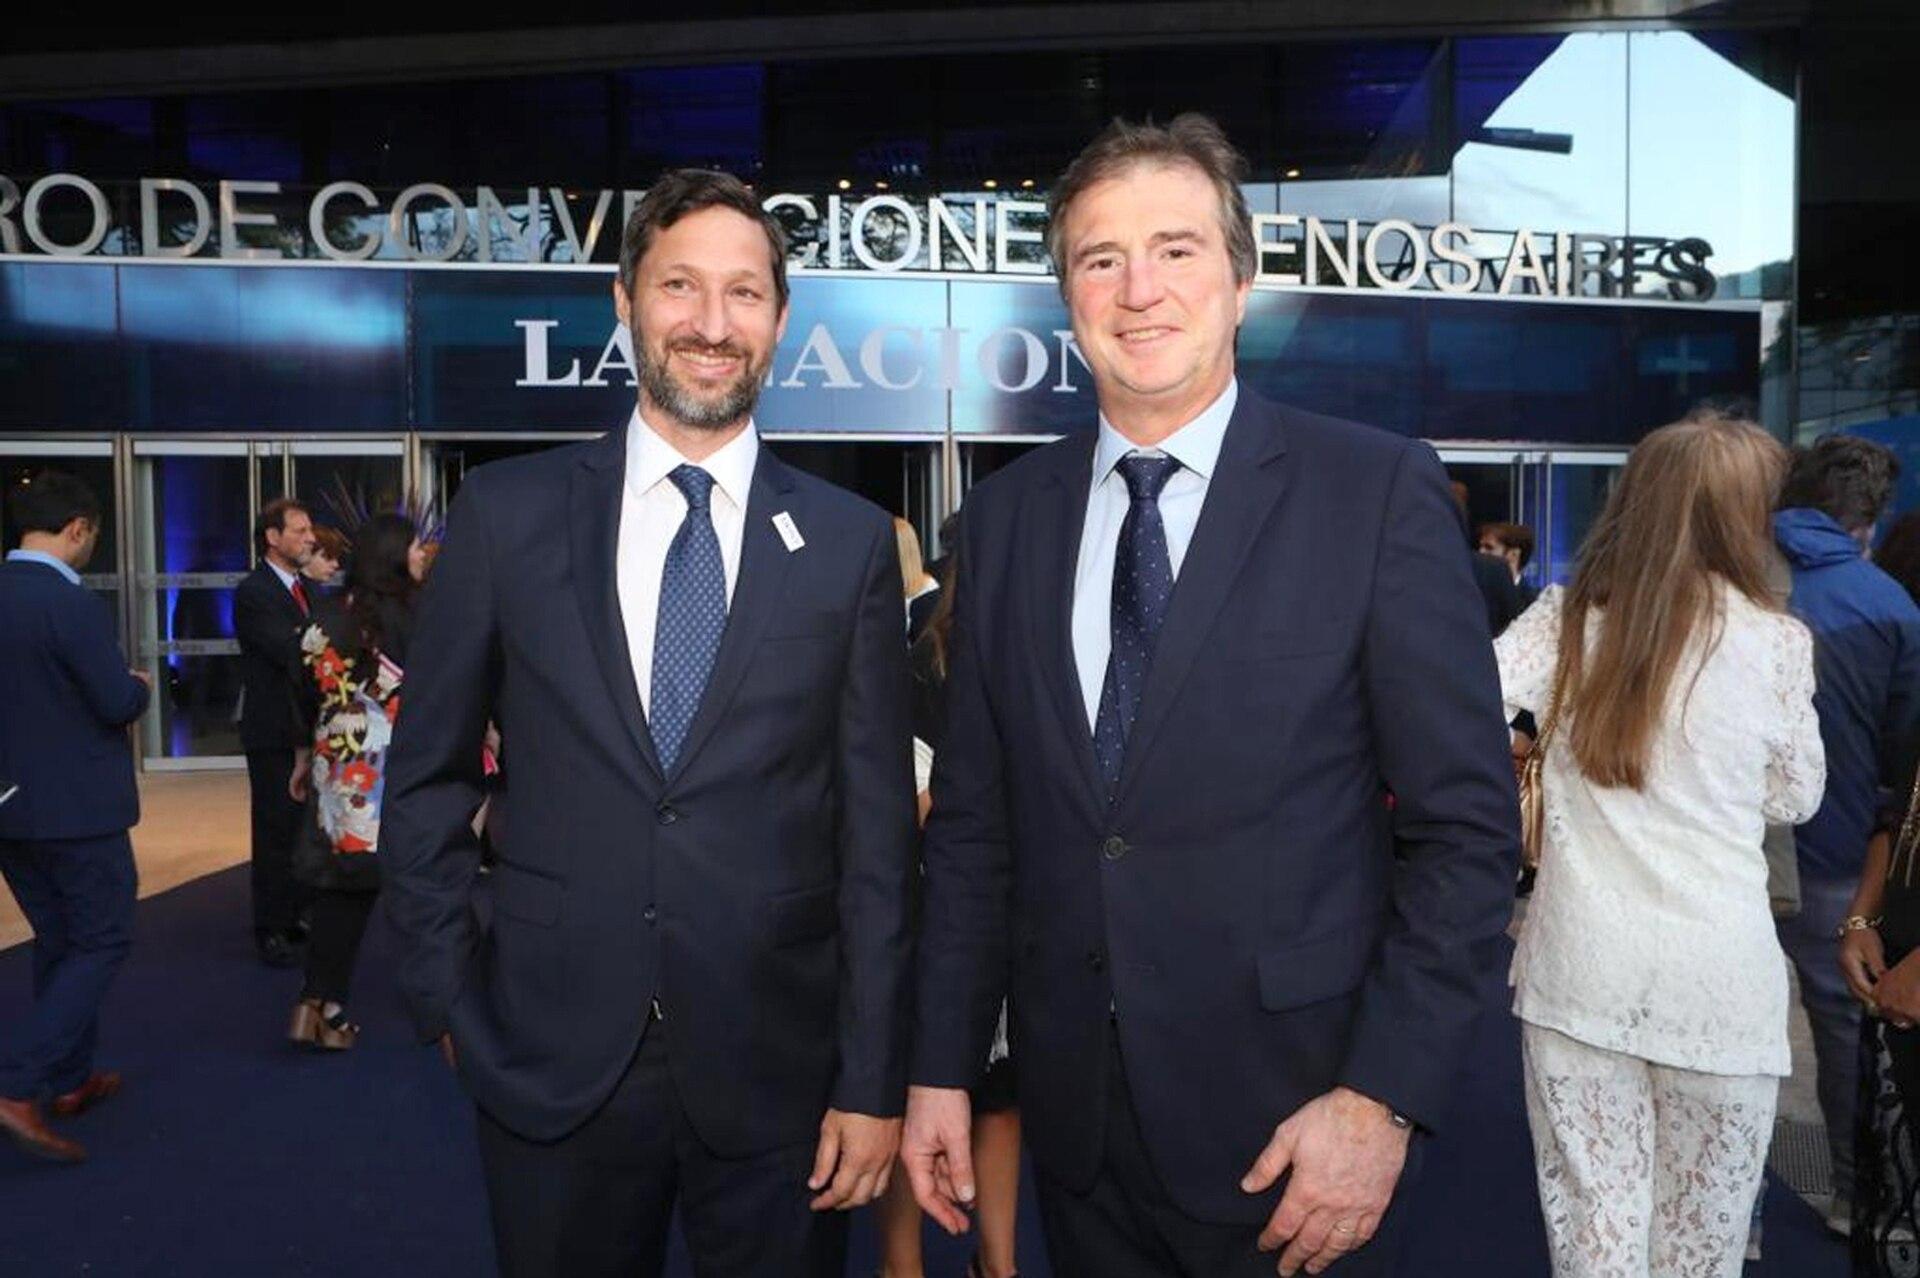 Eduardo Lomanto, ejecutivo del centro de entretenimiento Movistar Arena junto a Francisco Seghezzo, CEO de LA NACION